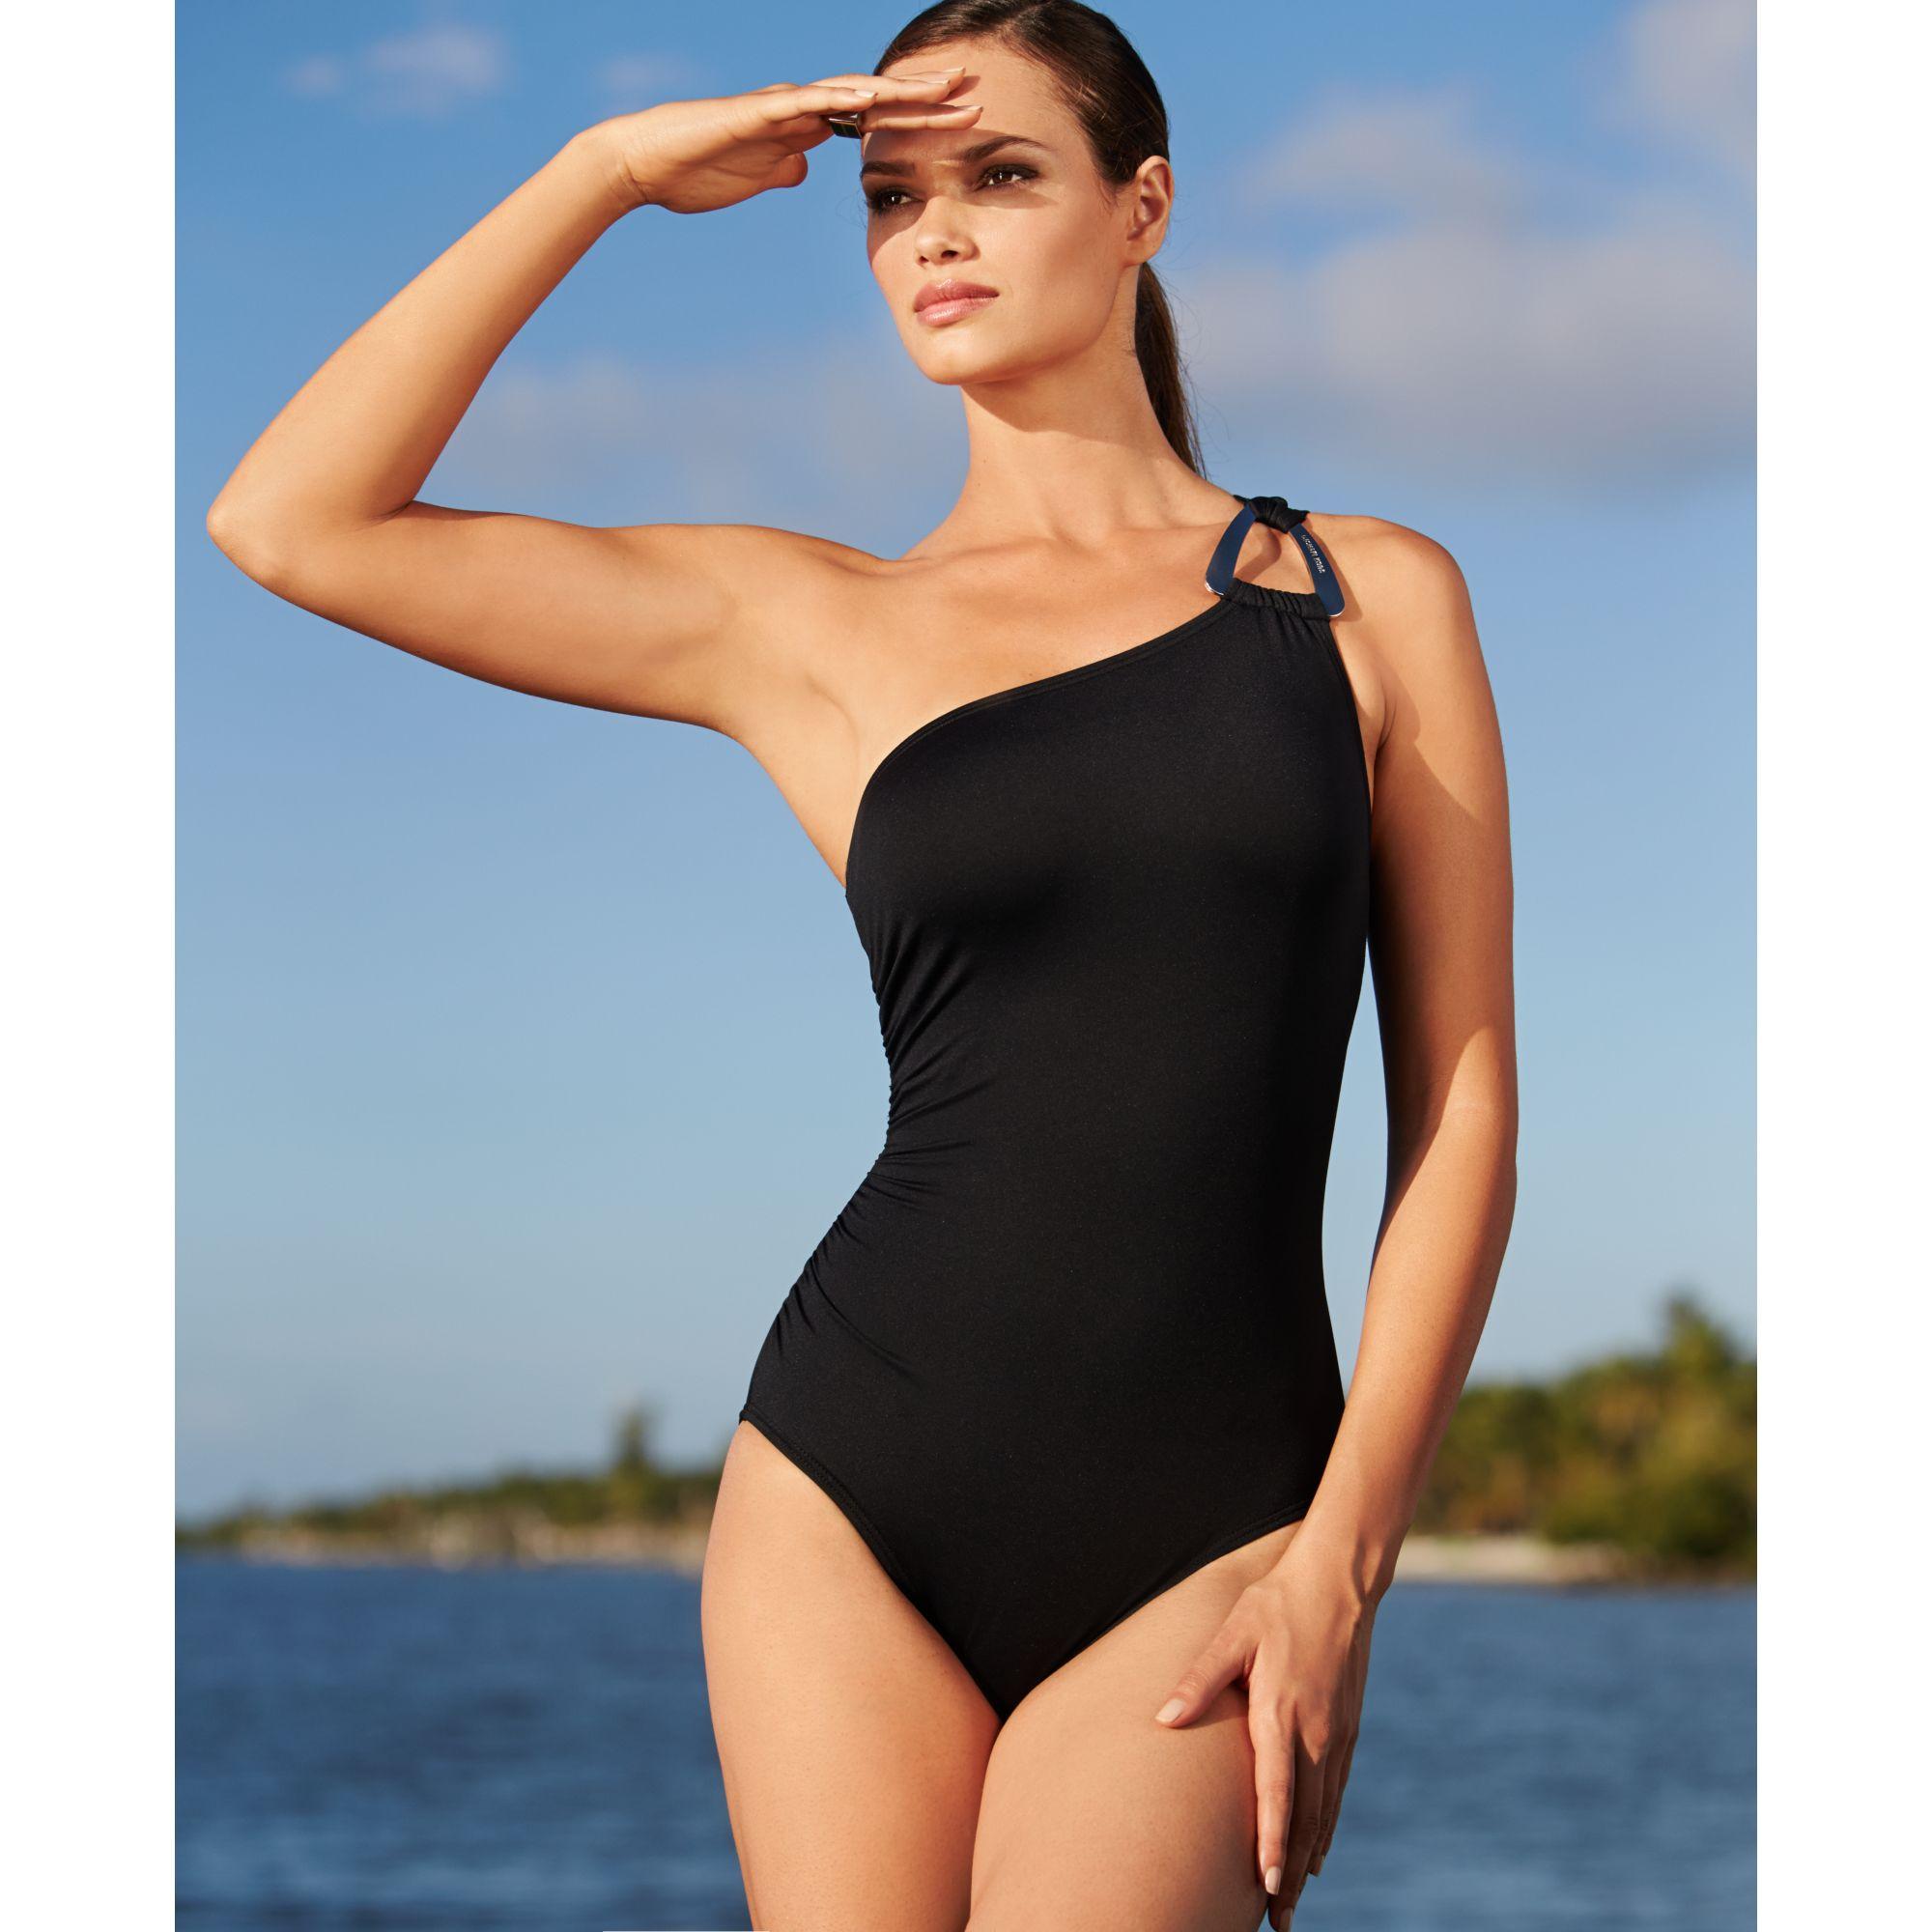 c555485d4be9a Michael Kors One Shoulder Swimsuit in Black - Lyst